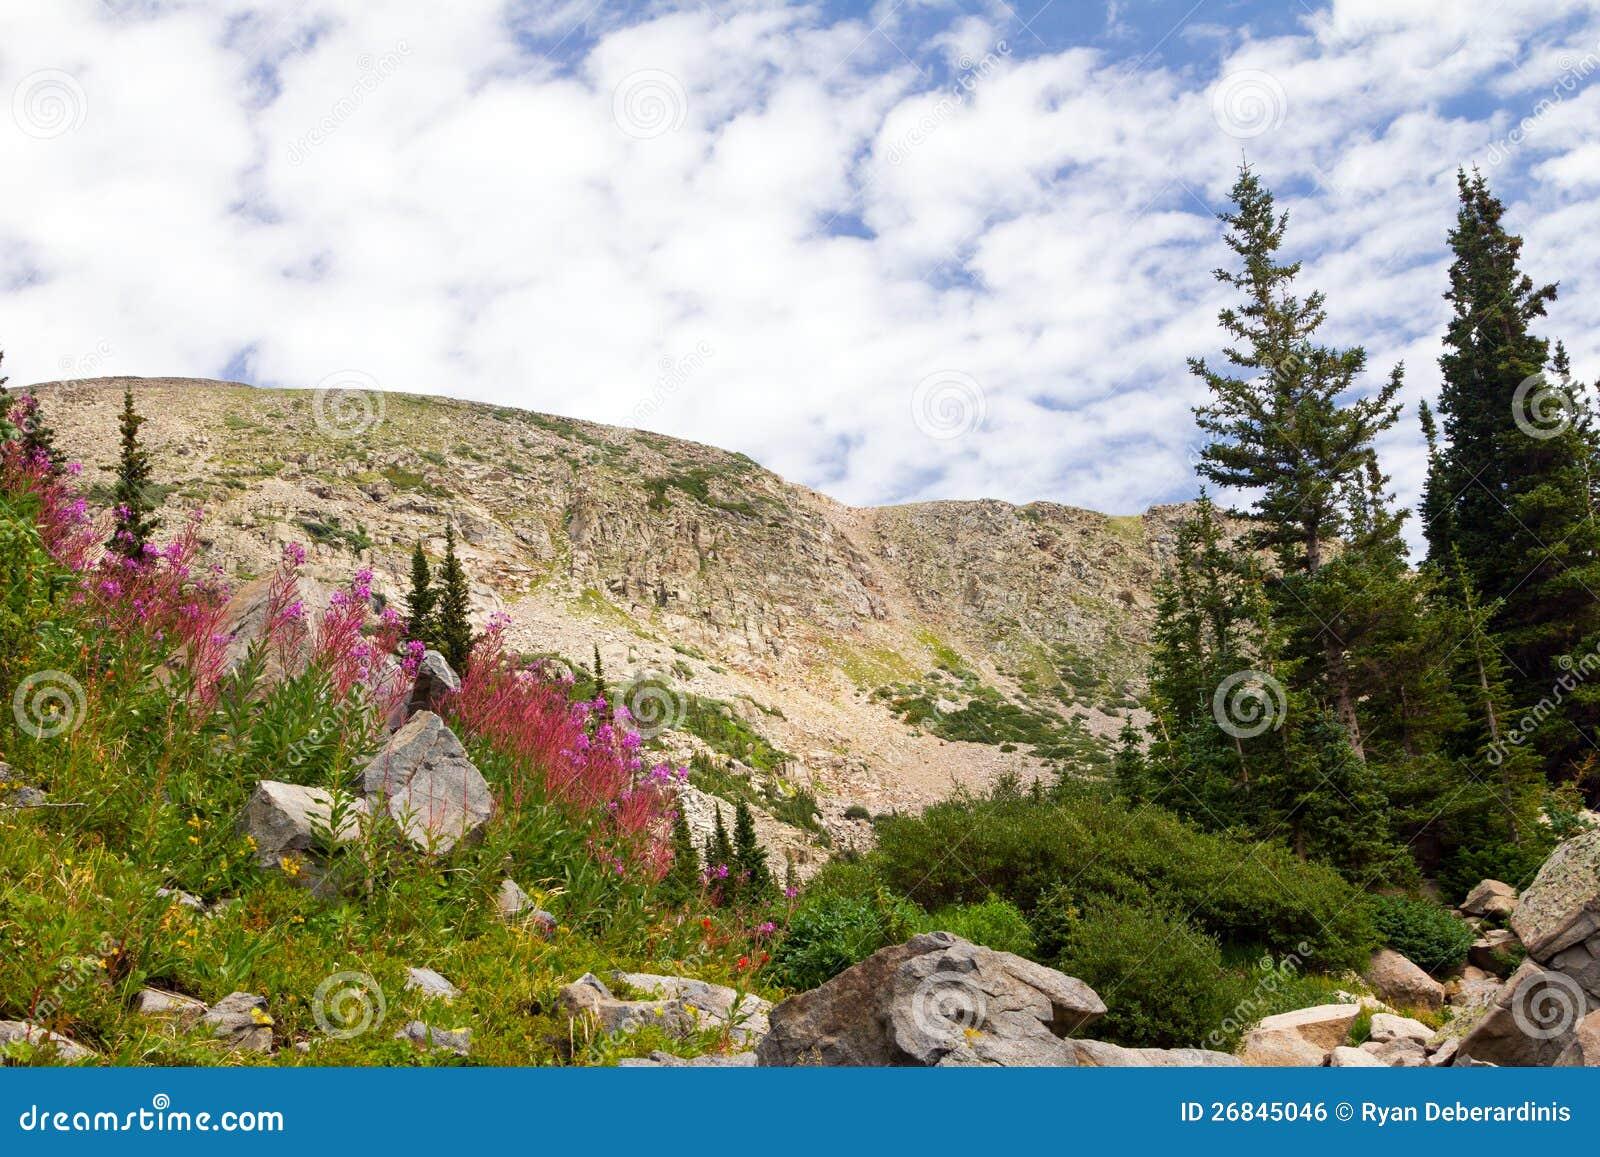 Colorado Summer Flowers Mountain Landscape Royalty Free ...